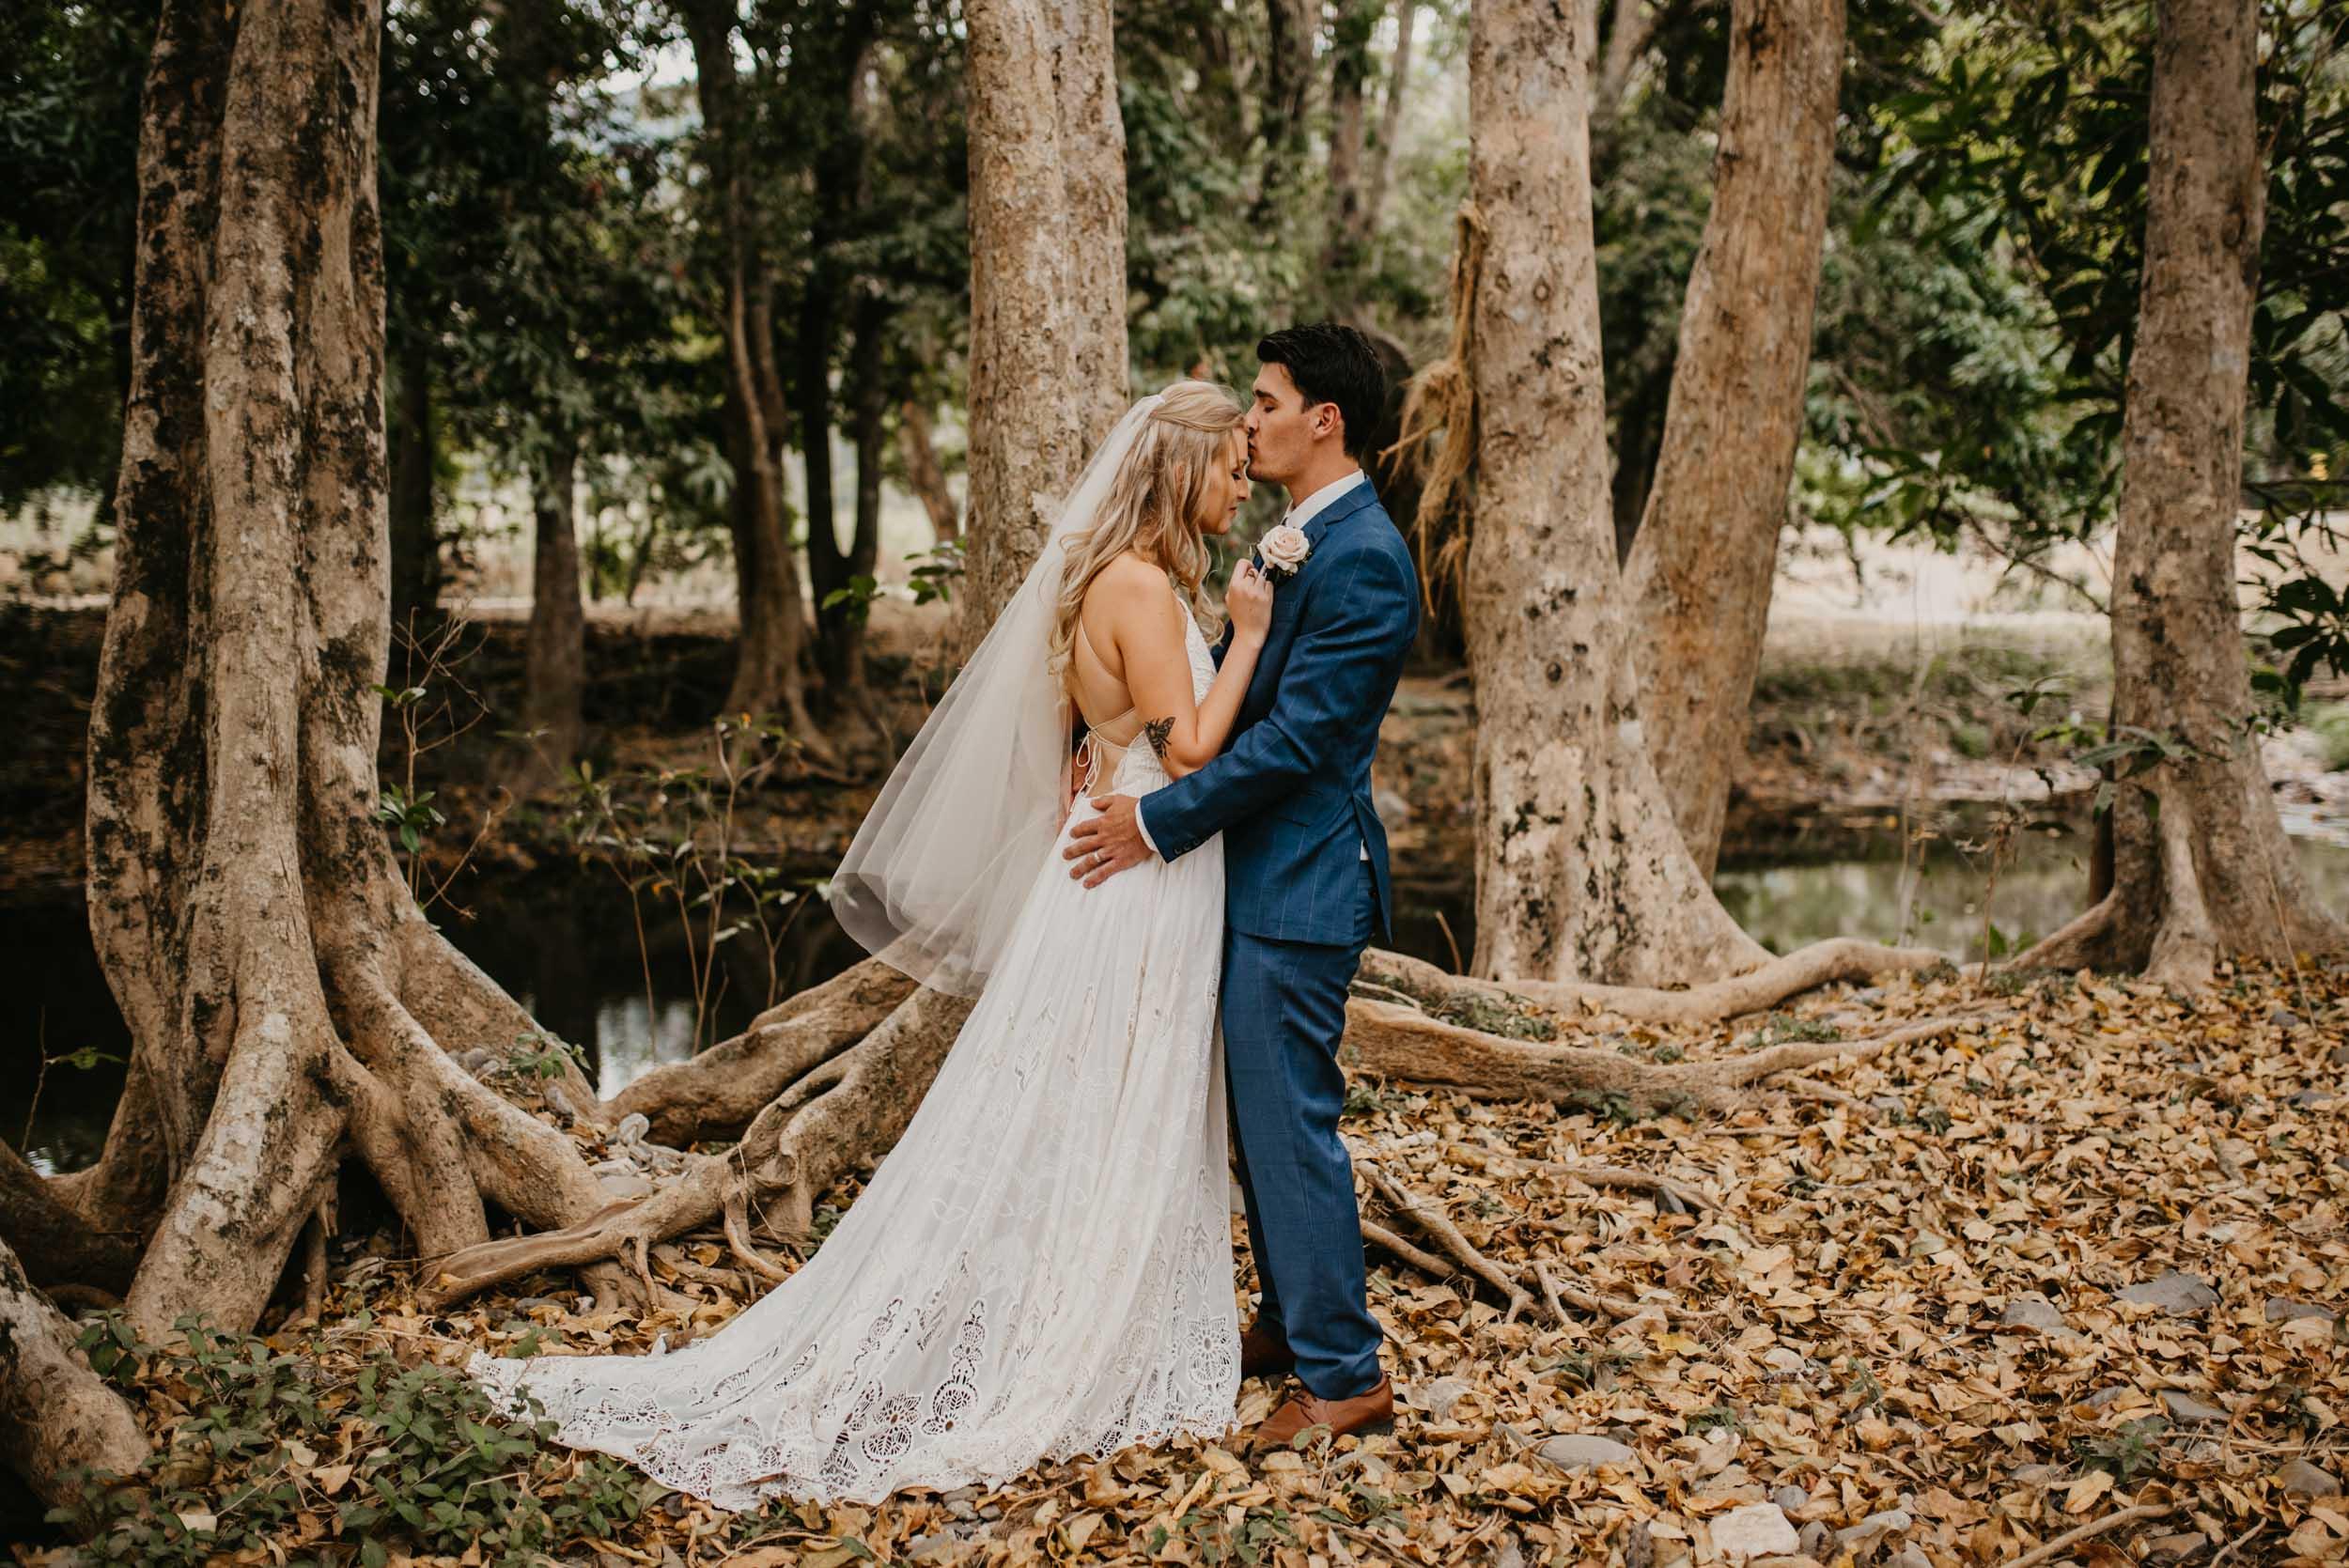 The Raw Photographer - Cairns Wedding Photographer - Laloli - Cairns Garden Wedding - Wedding Dress-56.jpg